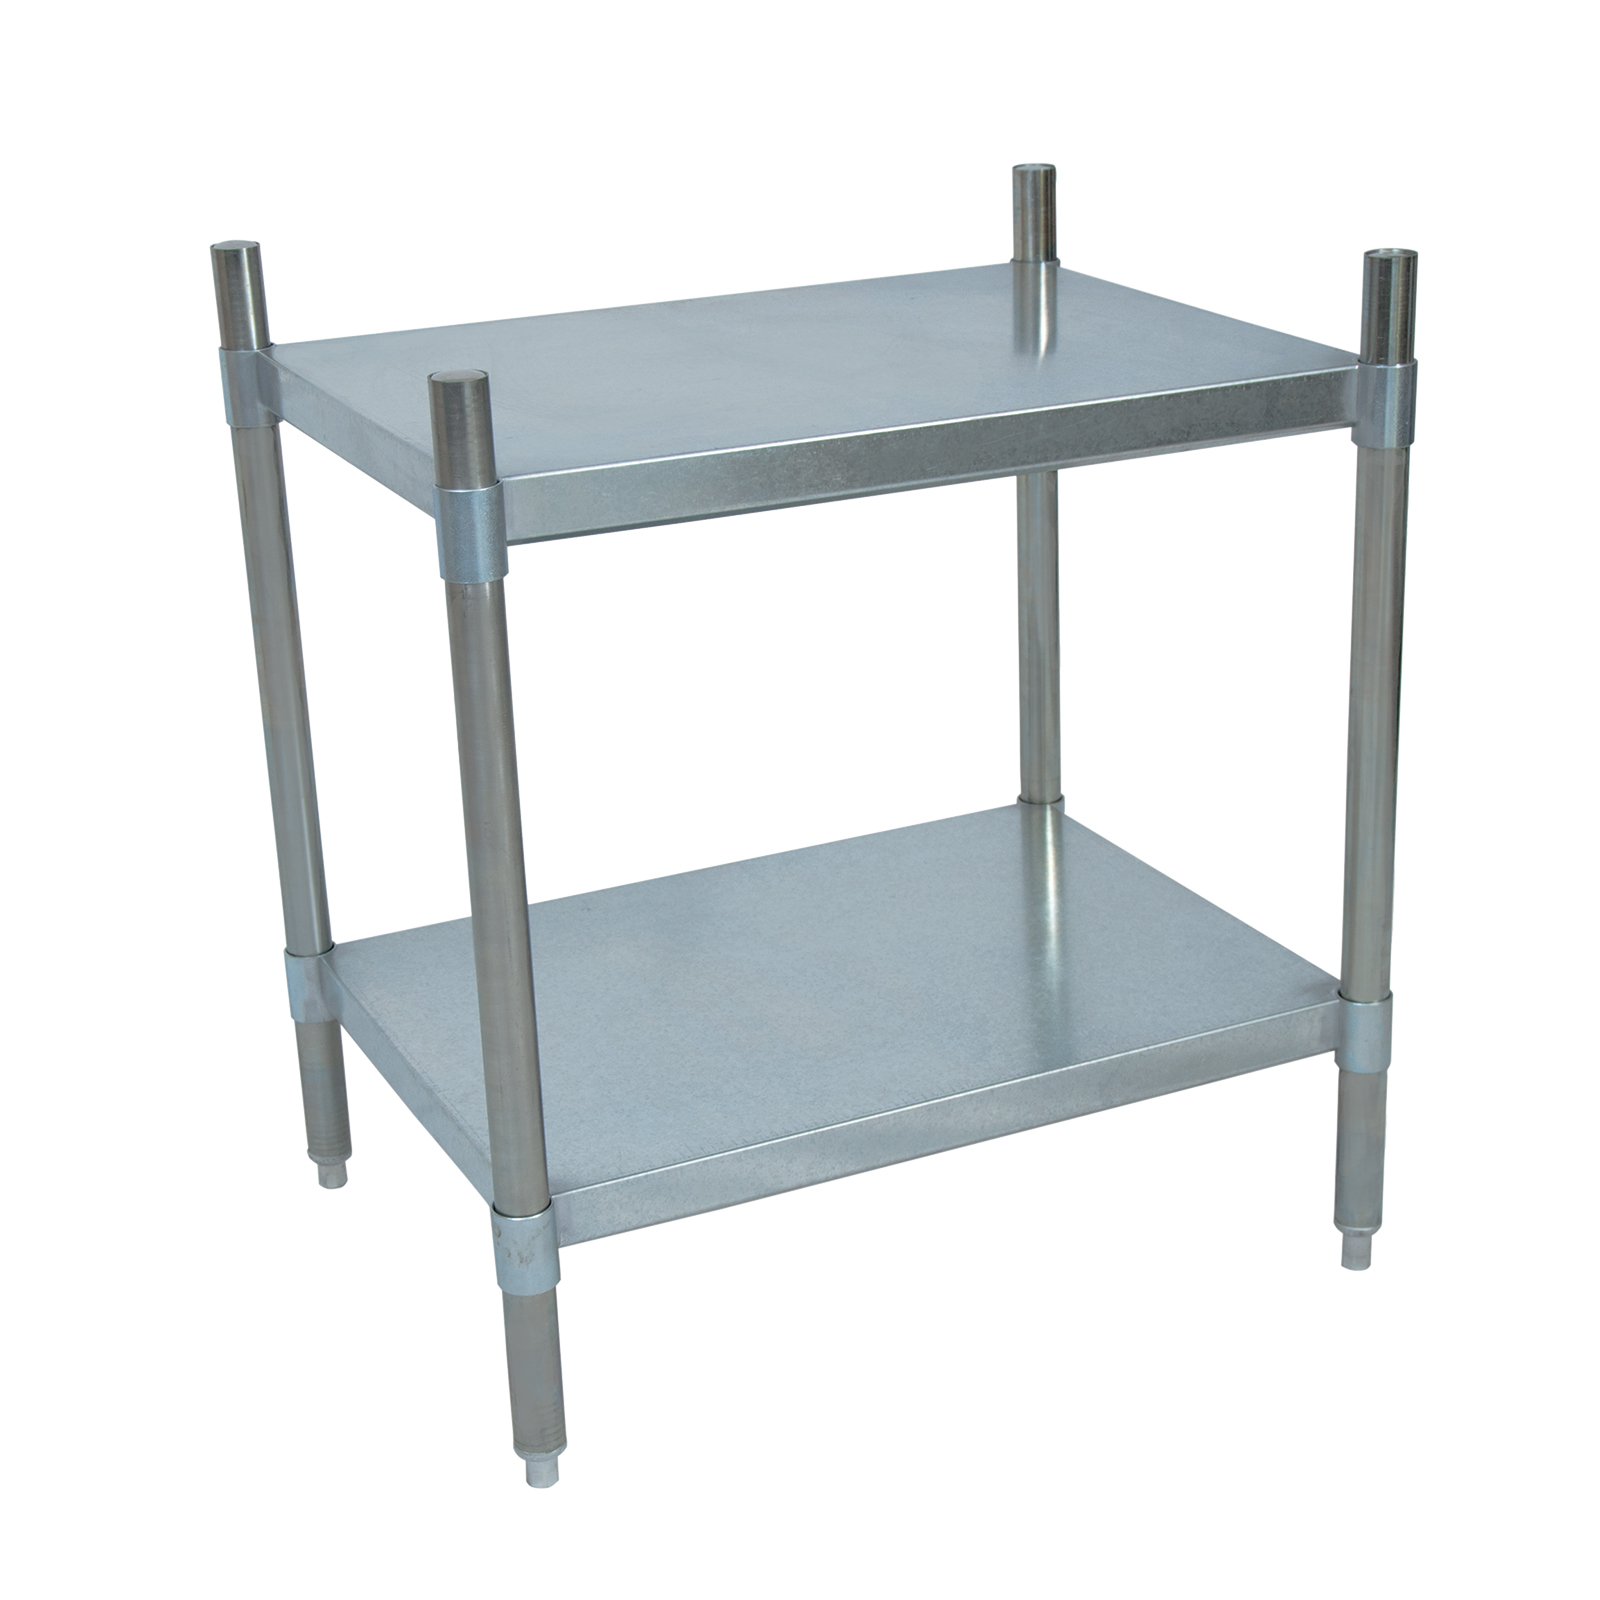 BK Resources SSU3-5524 shelving unit, solid flat